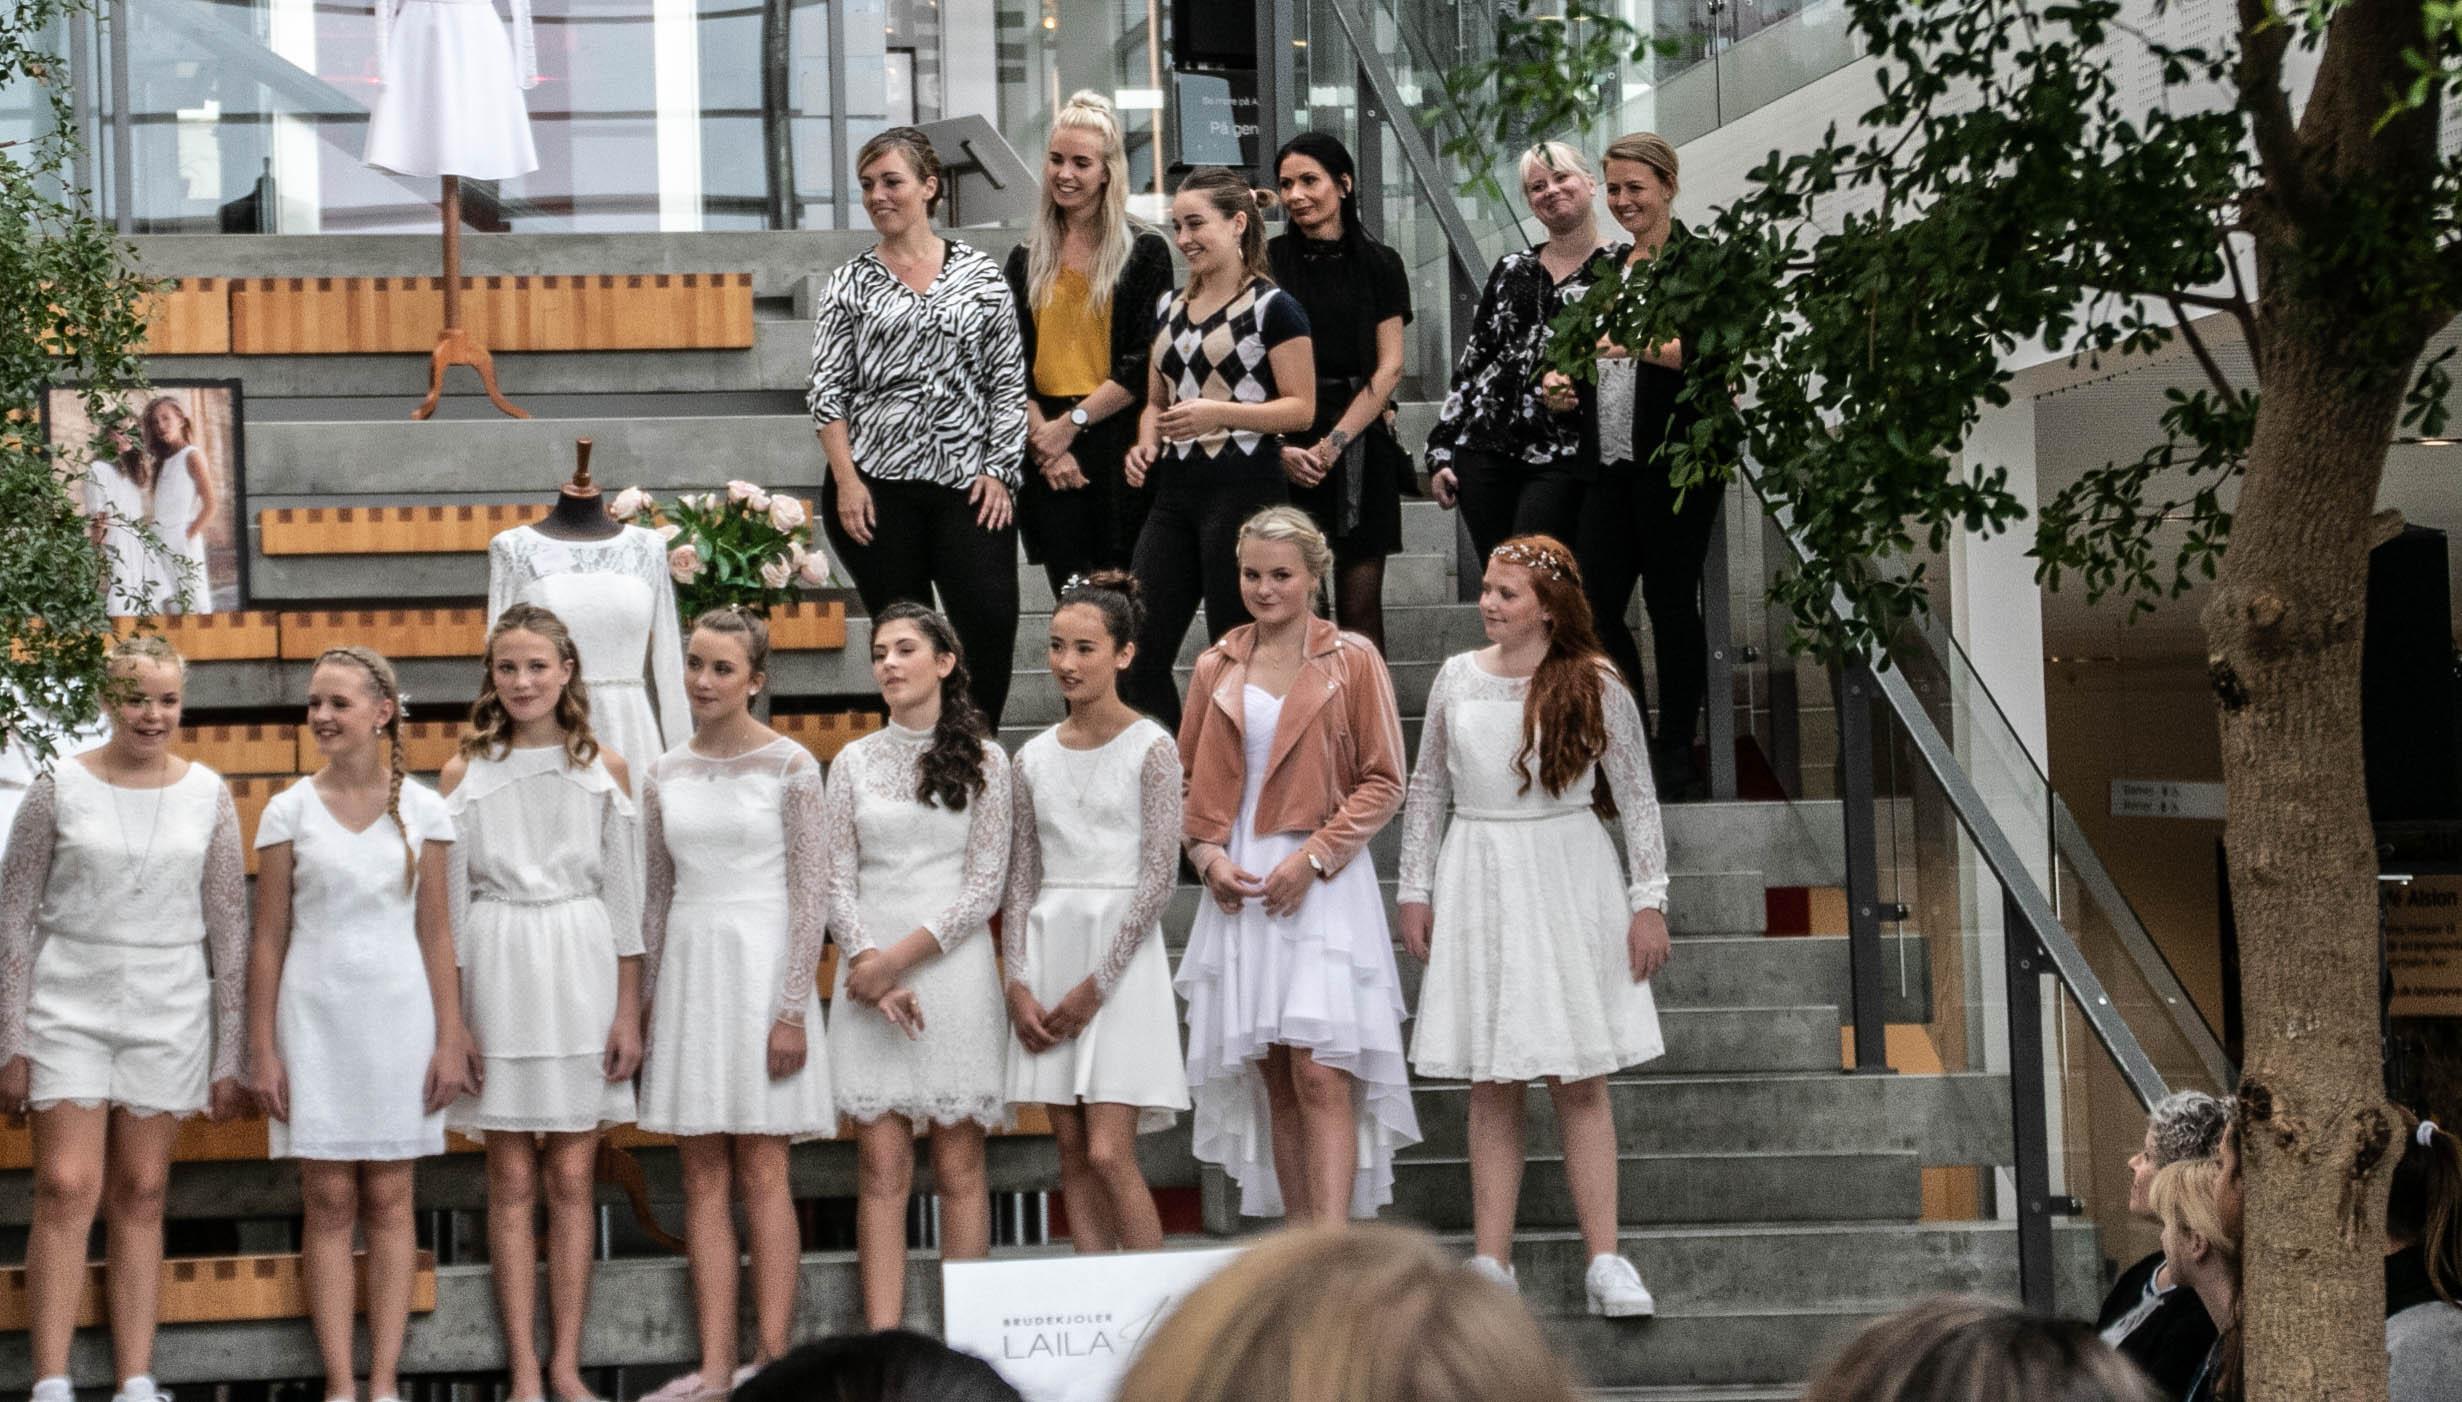 e01a88255123 Billeder  Brudekjoler Laila Helt viser konfirmandmoden 2019 ...